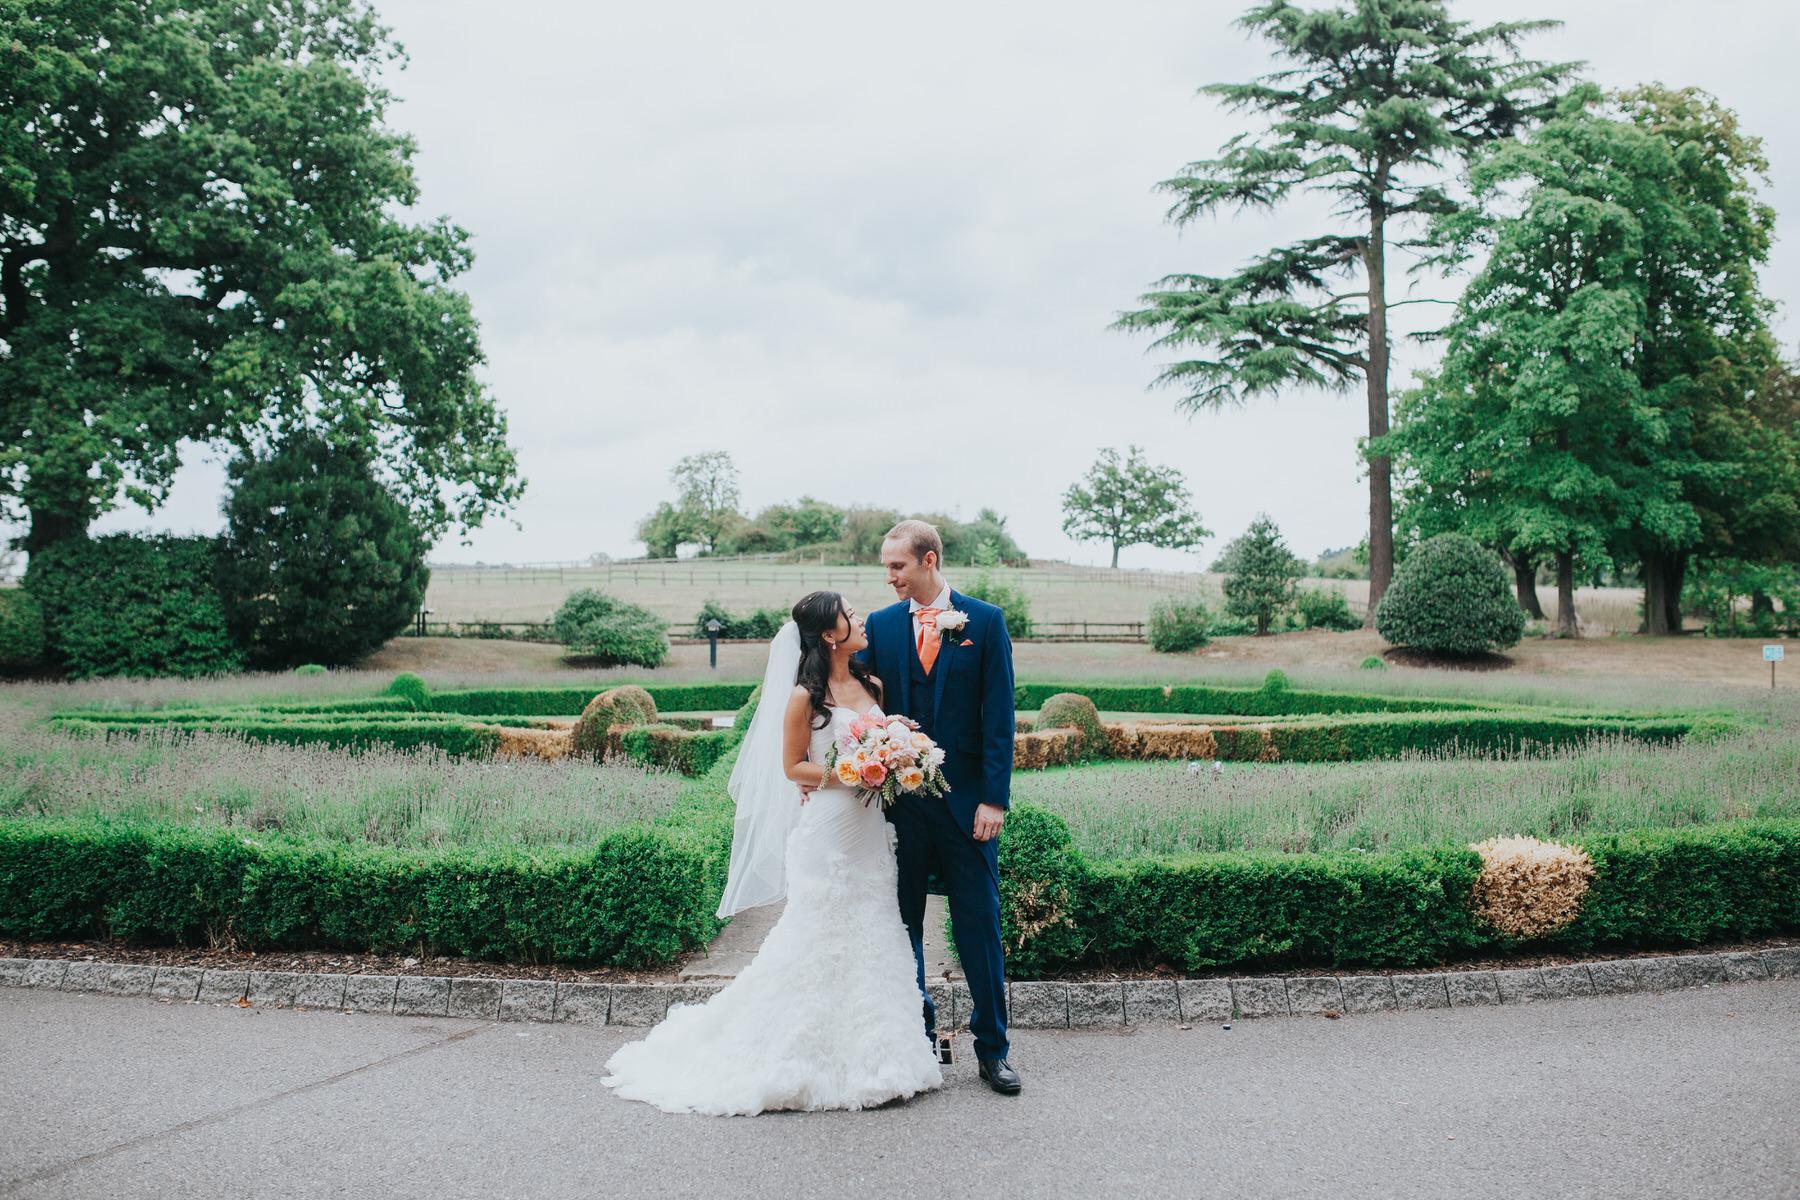 288 bride groom wedding portraits Woodlands Hotel photography.jpg